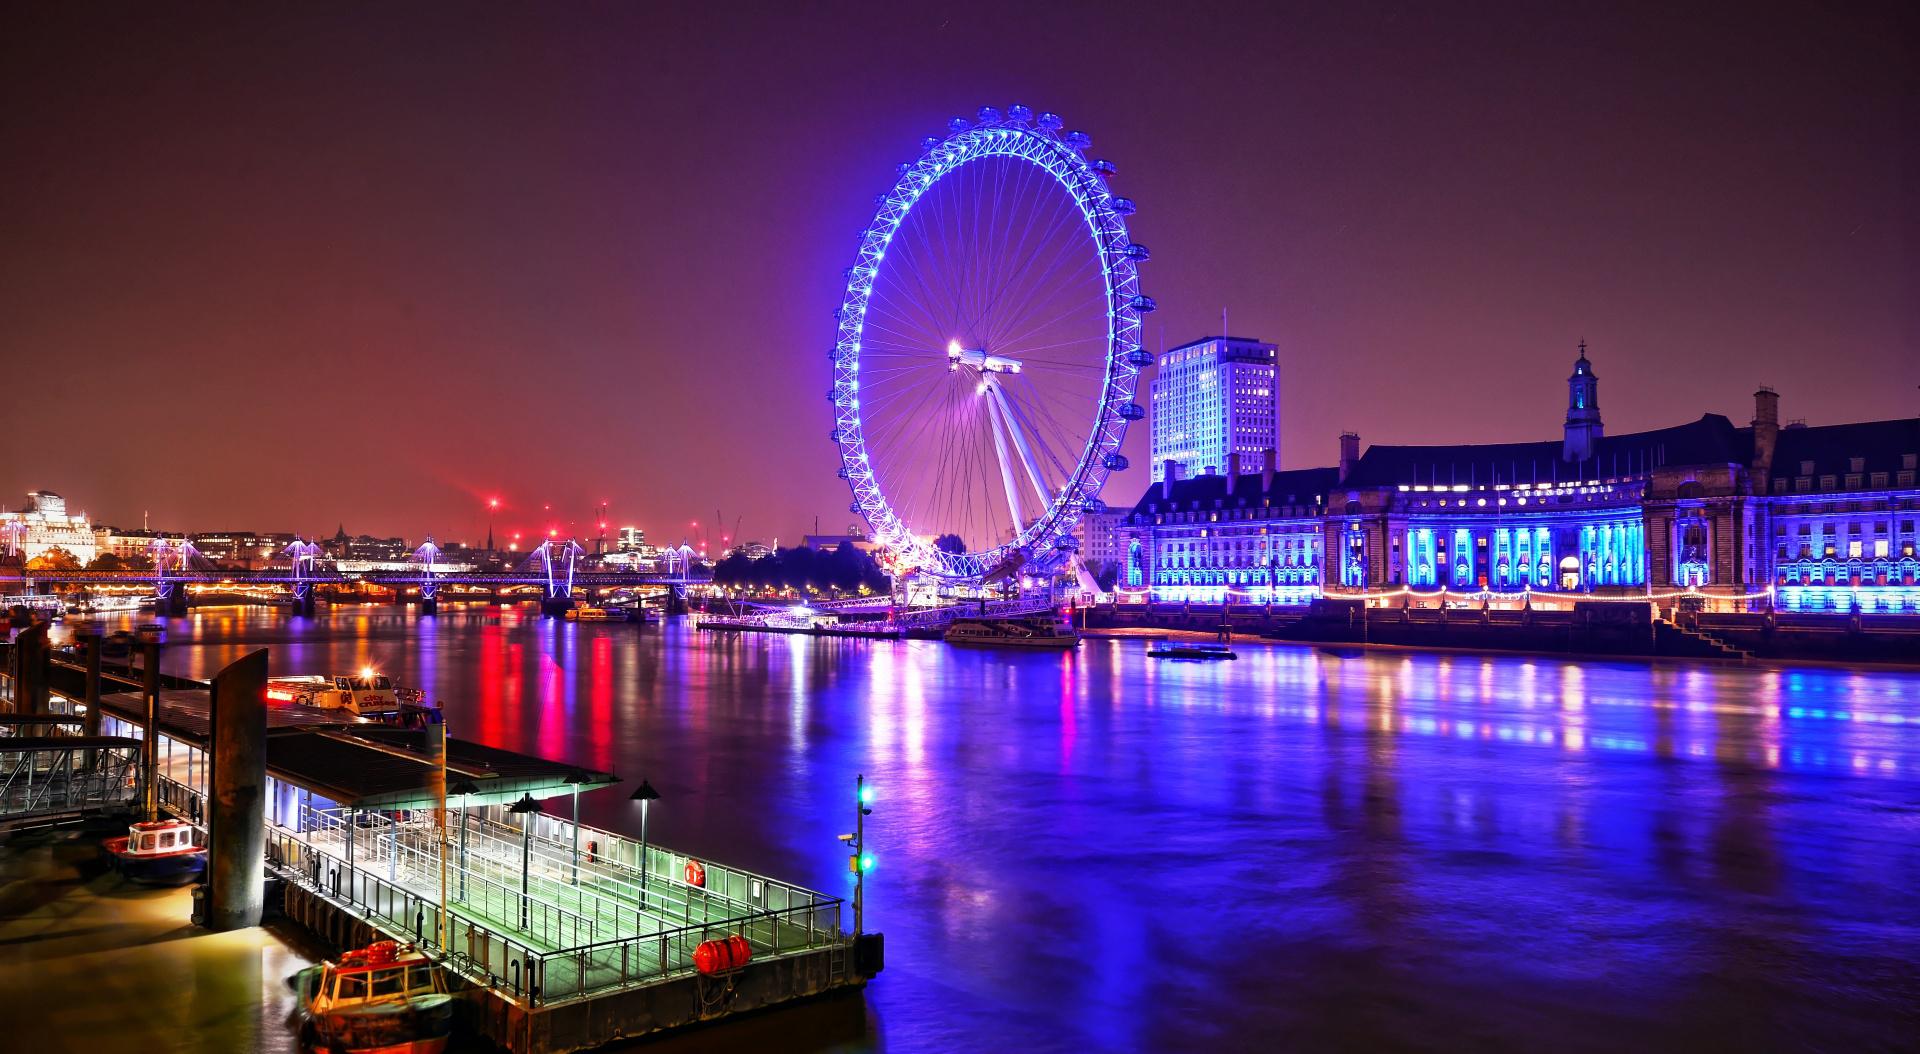 City at night 52069 - Urban Landscape - City building